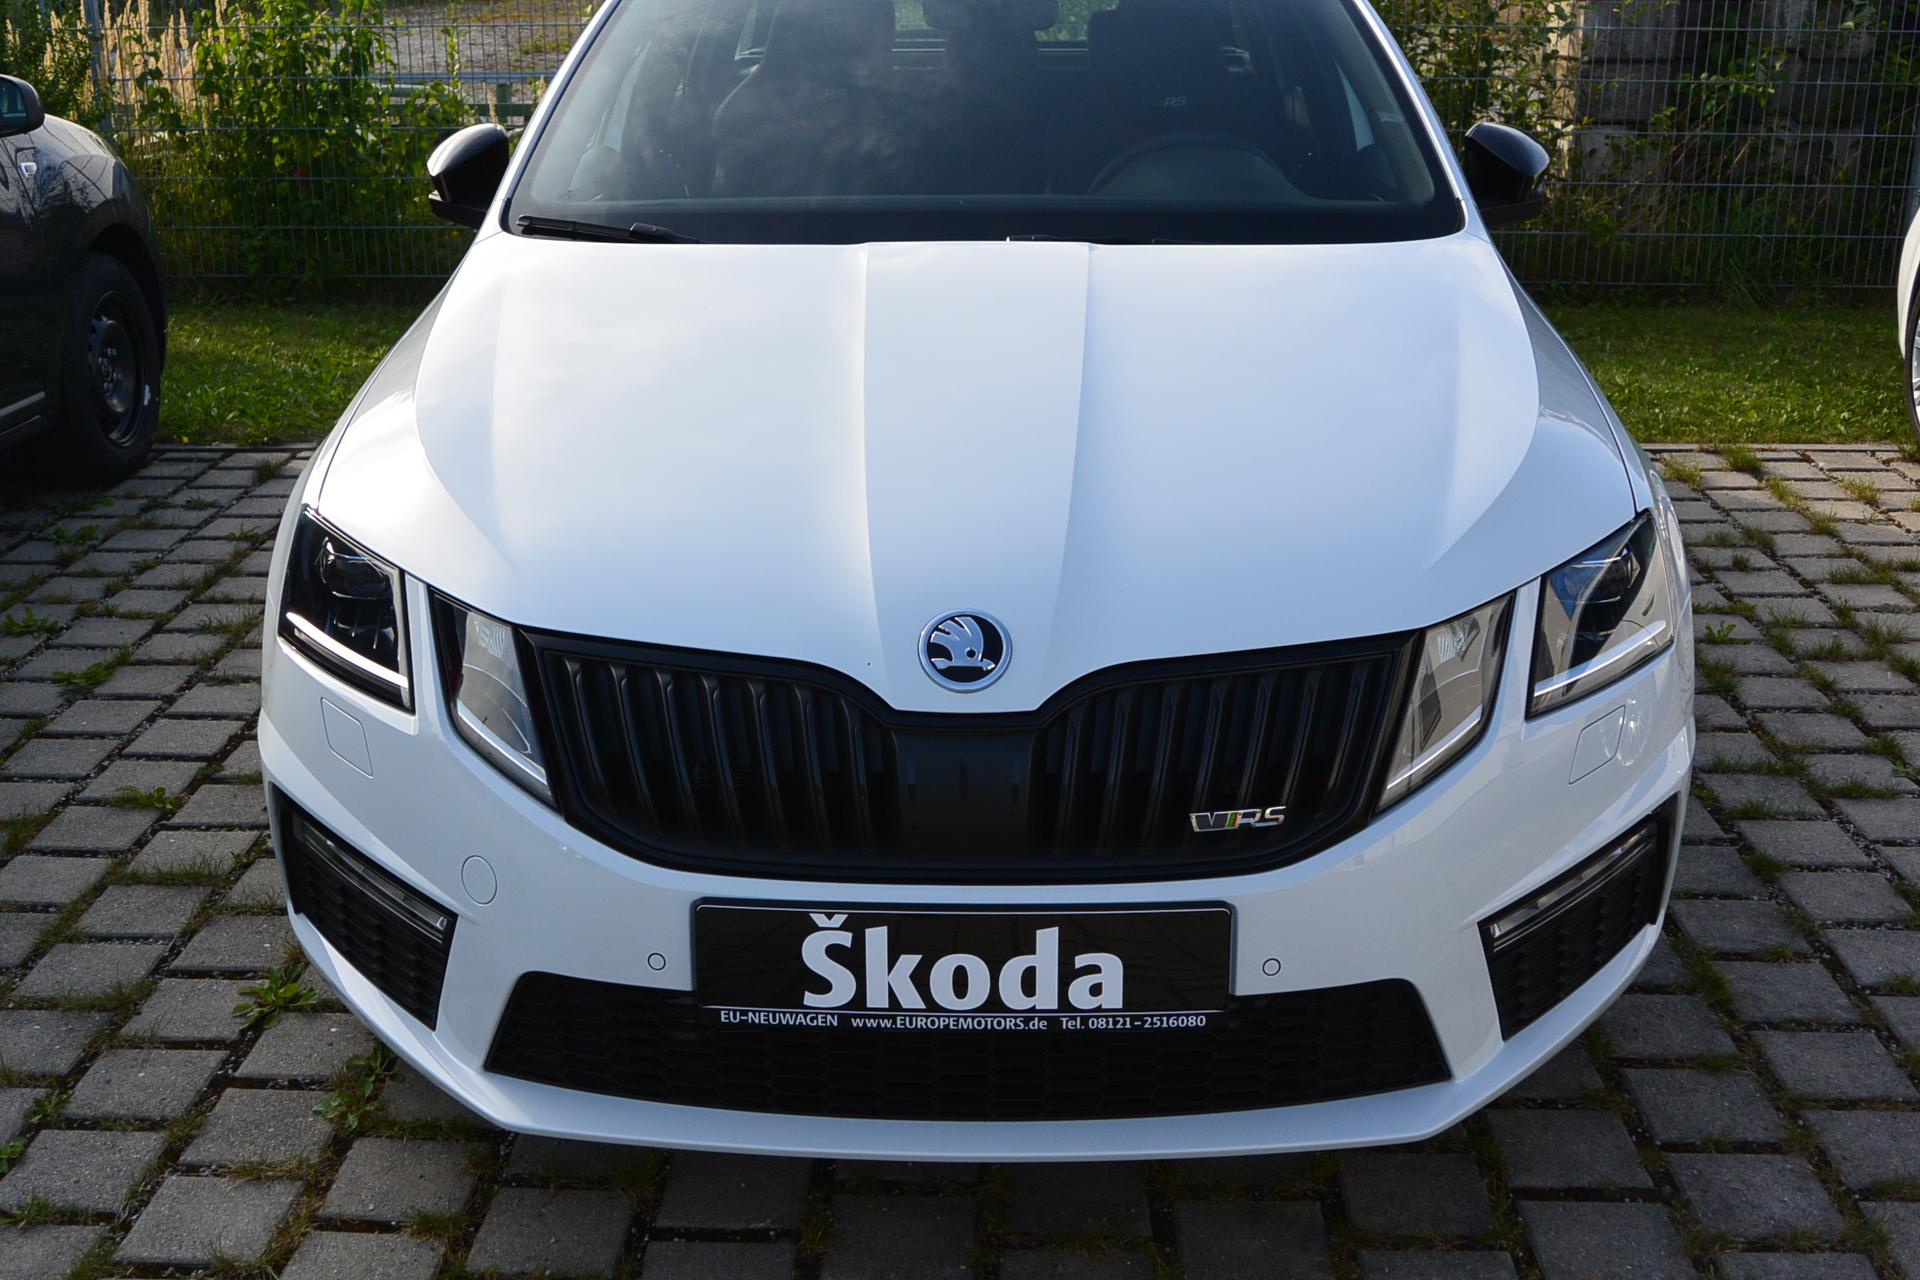 Skoda Octavia RS bi 2 0 TSI 180 kW 245 PS Reimport EU Neuwagen